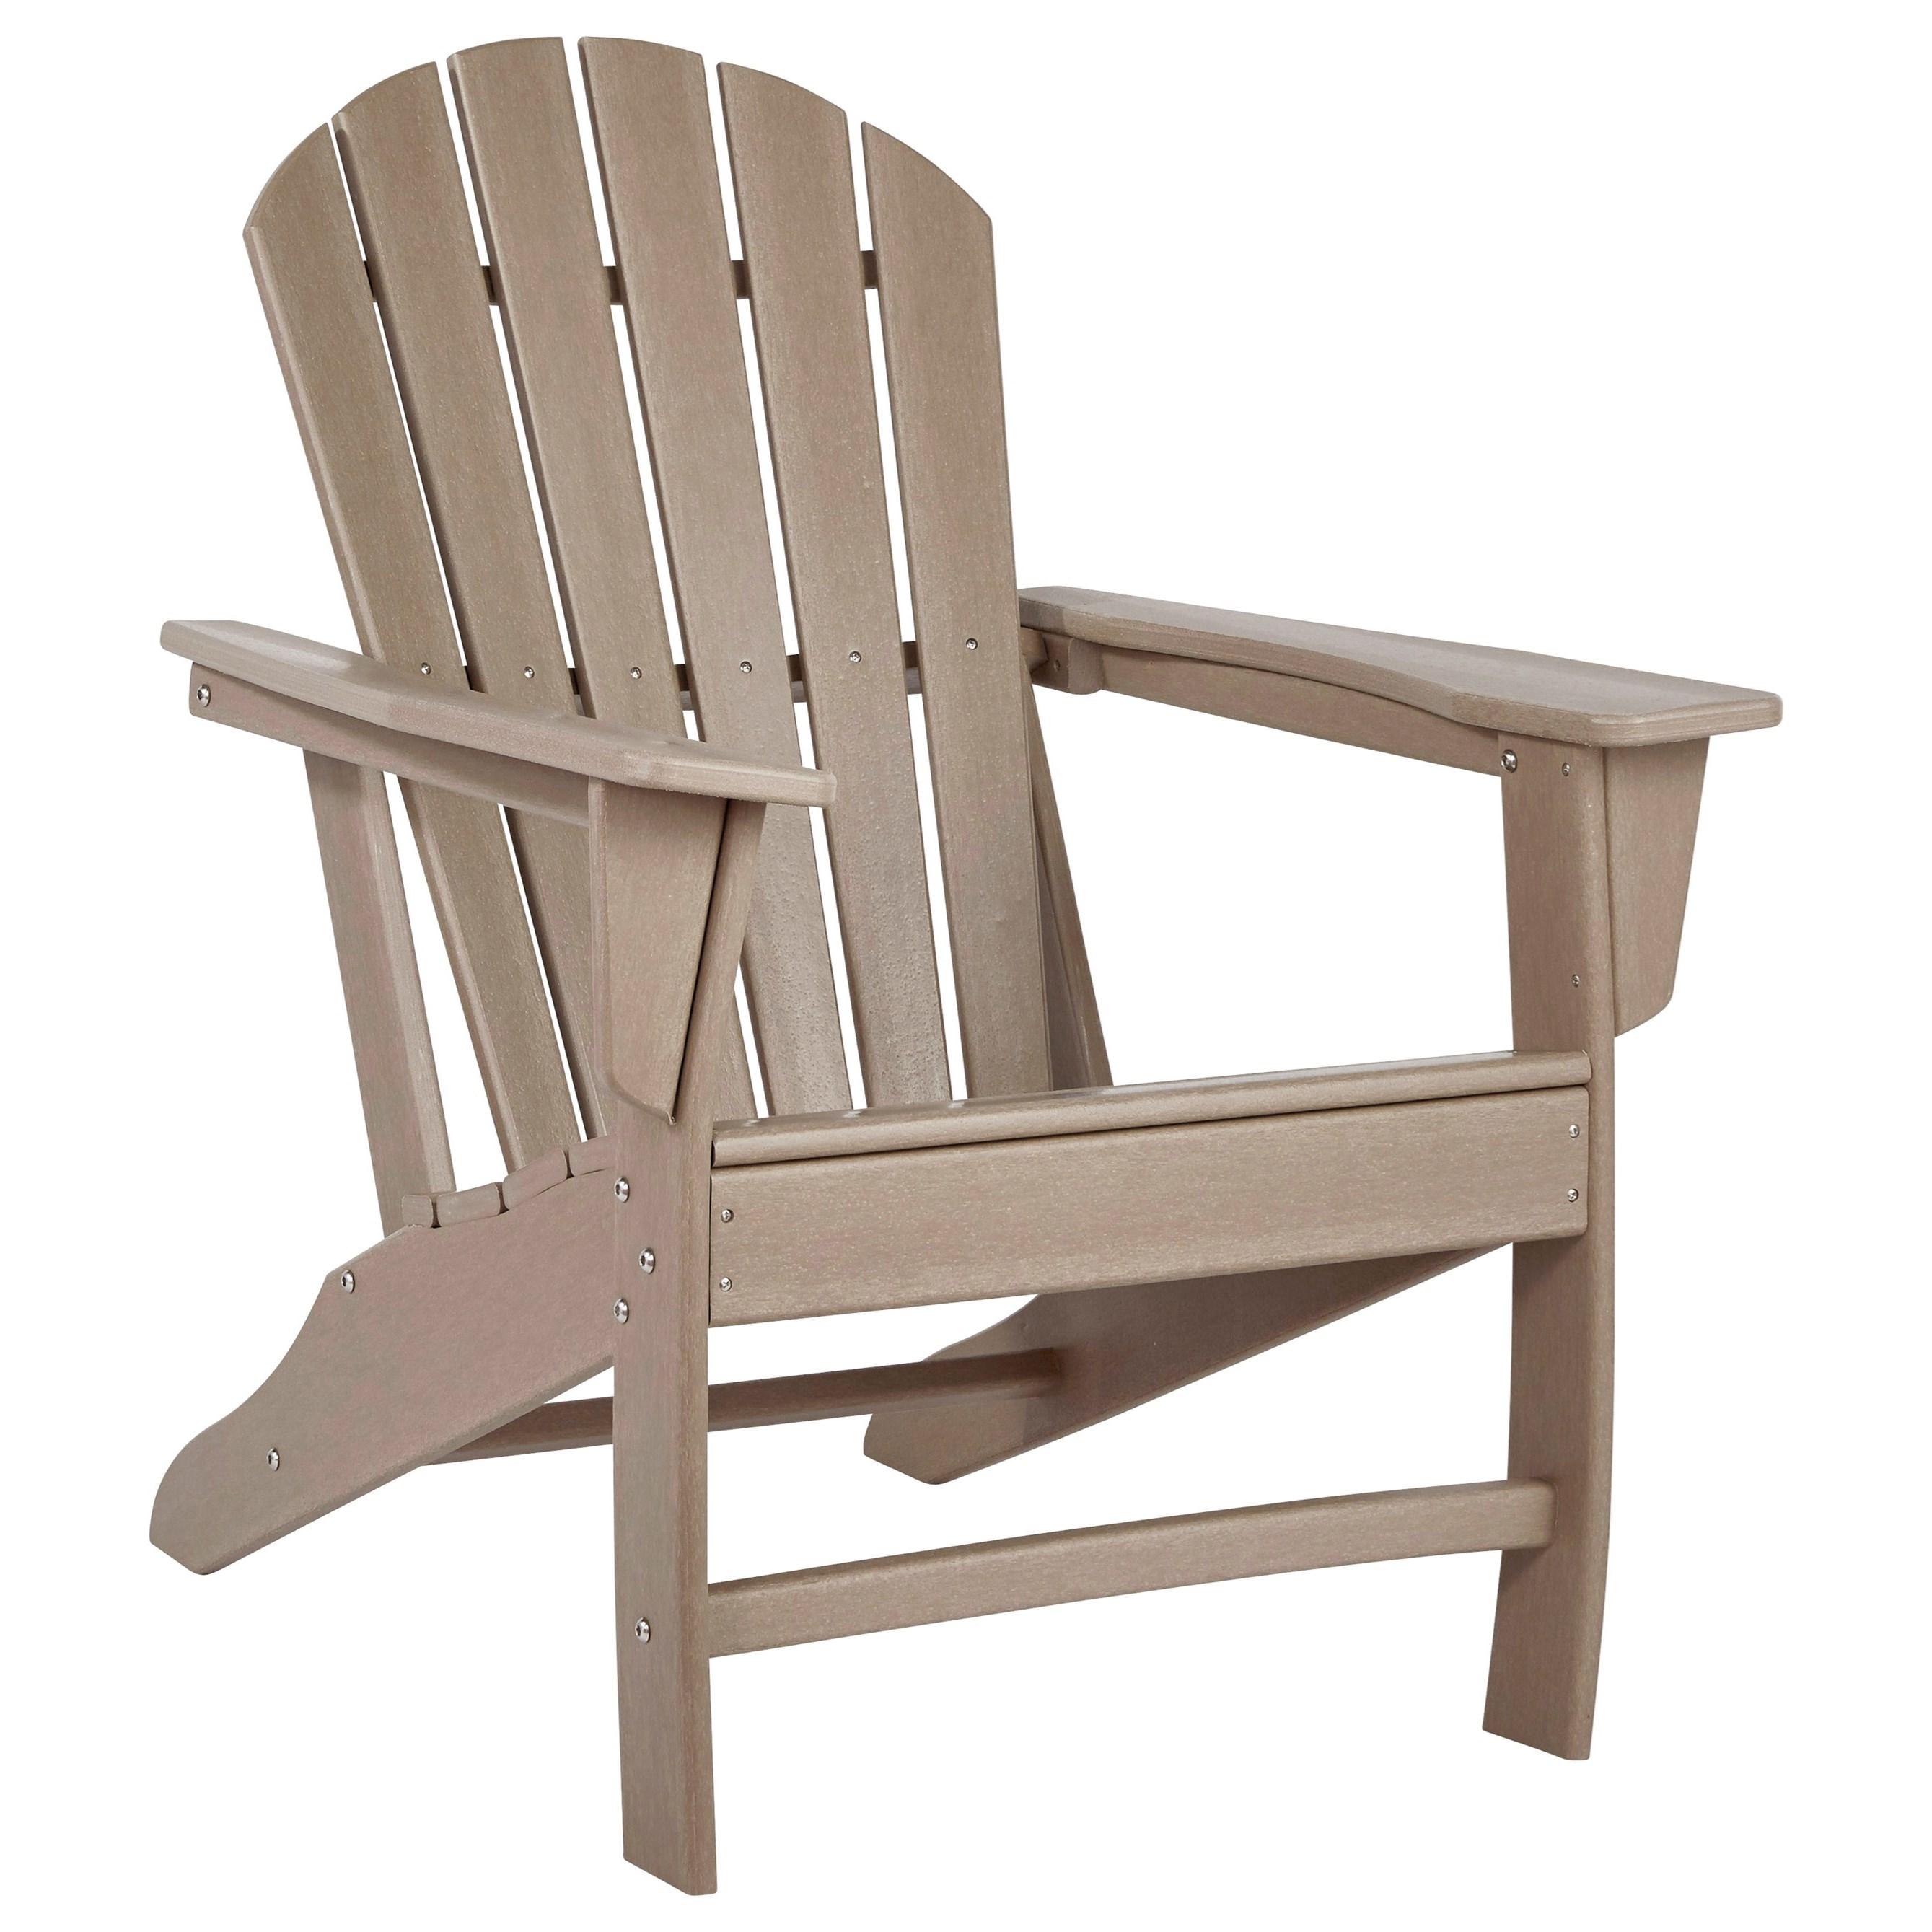 Sundown Treasure Adirondack Chair by Benchcraft at Virginia Furniture Market